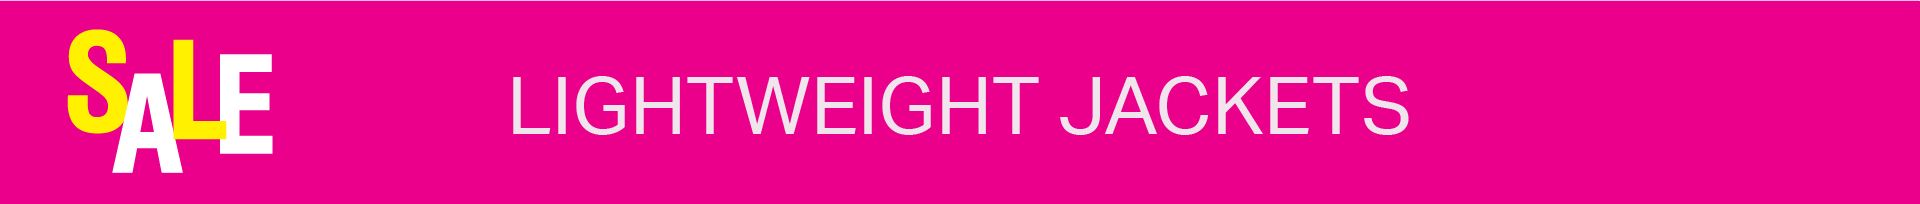 SALE: LIGHTWEIGHT JACKETS